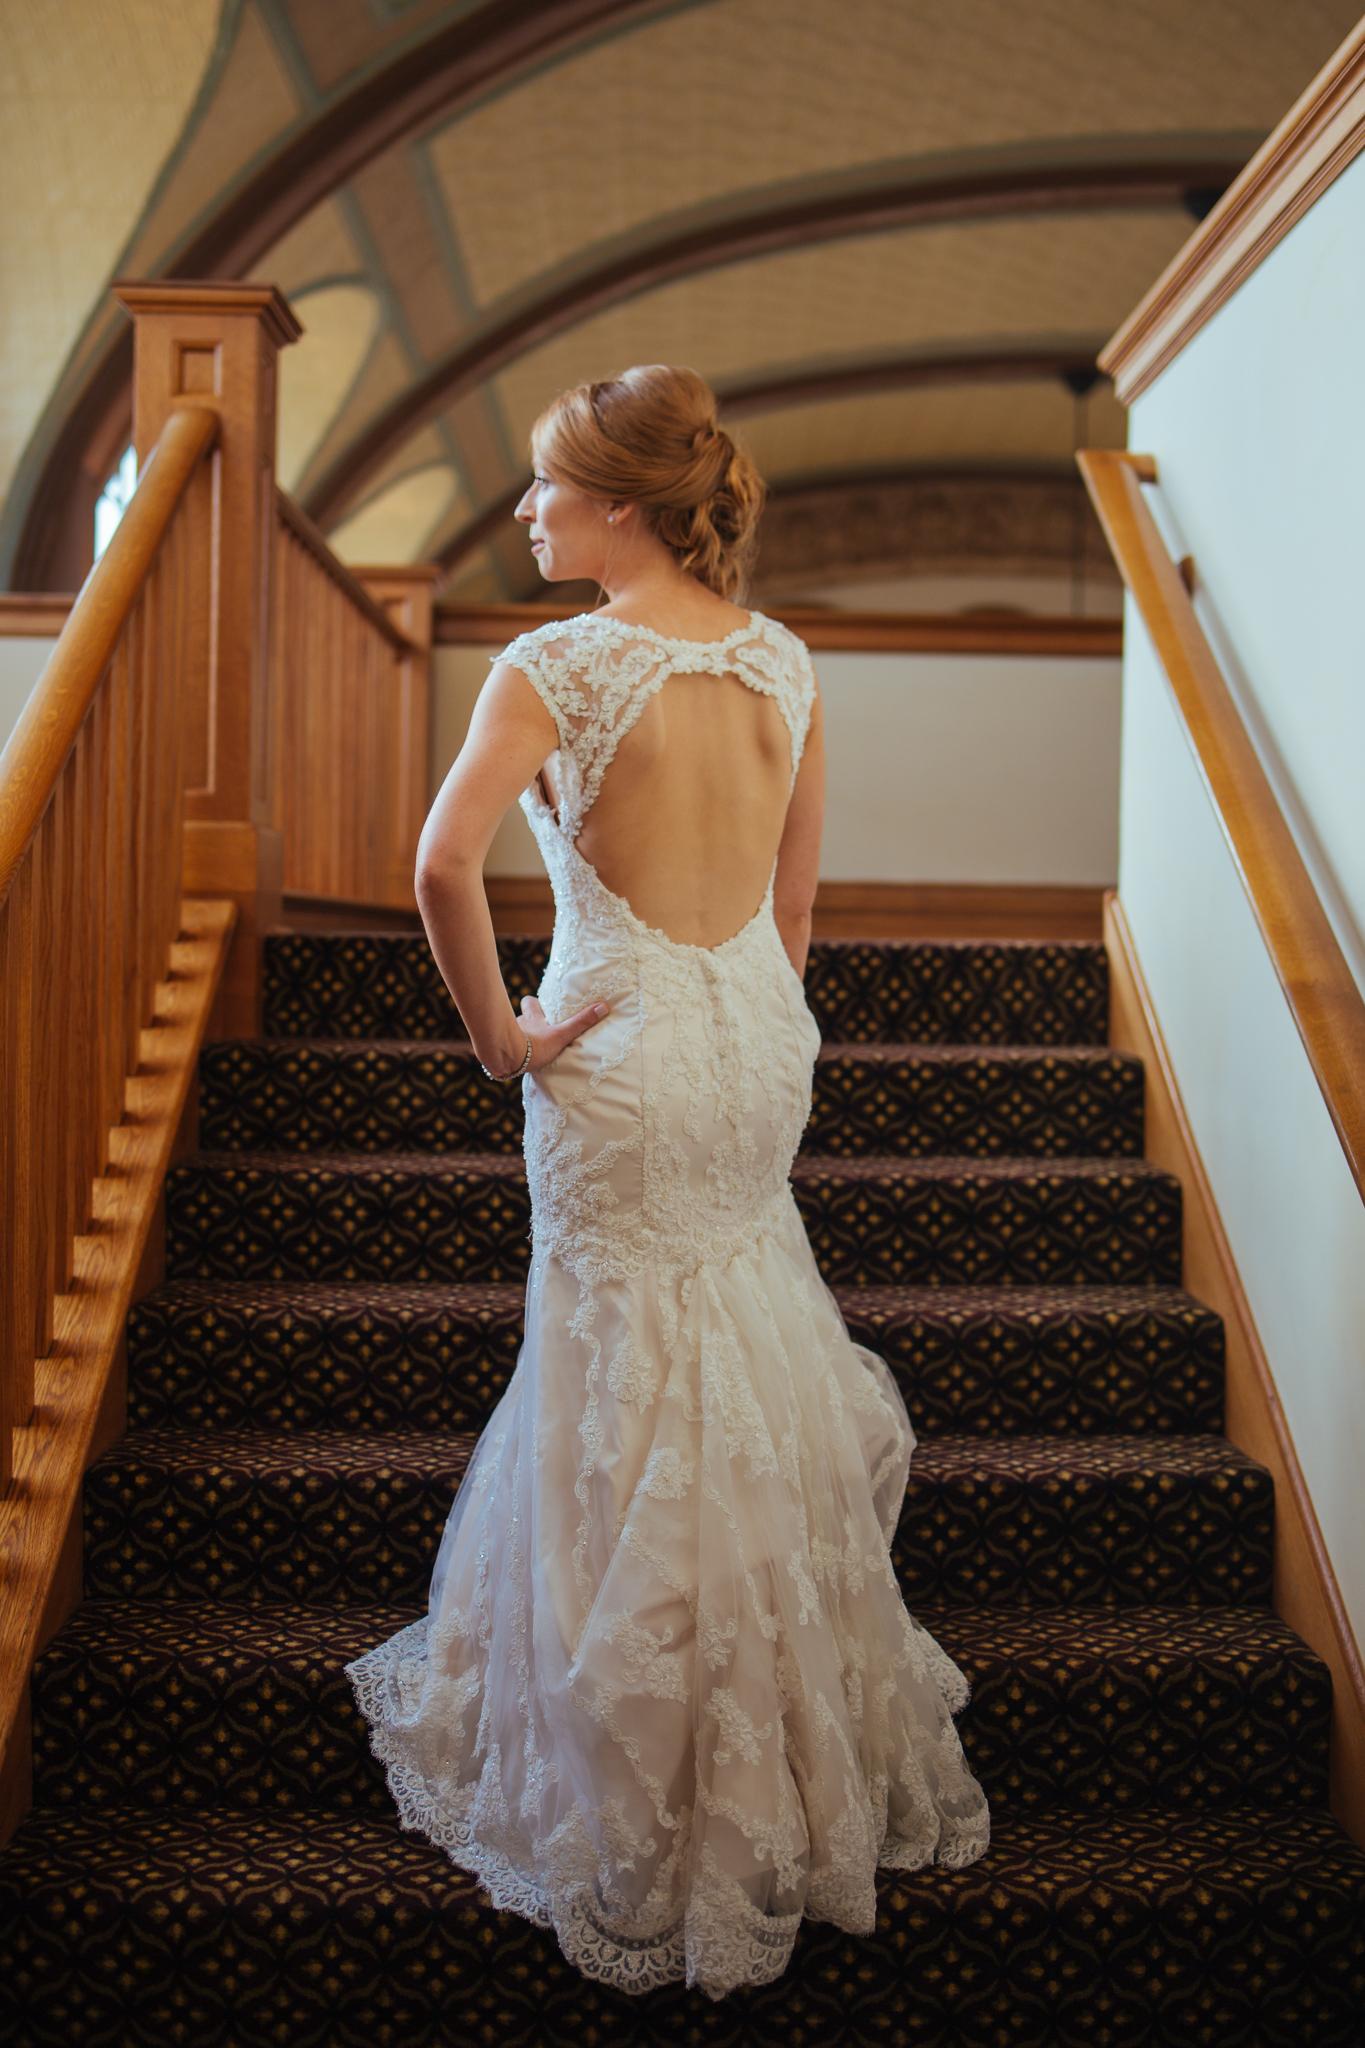 Michael and Kelly - the ashton depot - wedding DFW - wedding photographer- elizalde photography (72 of 150).jpg